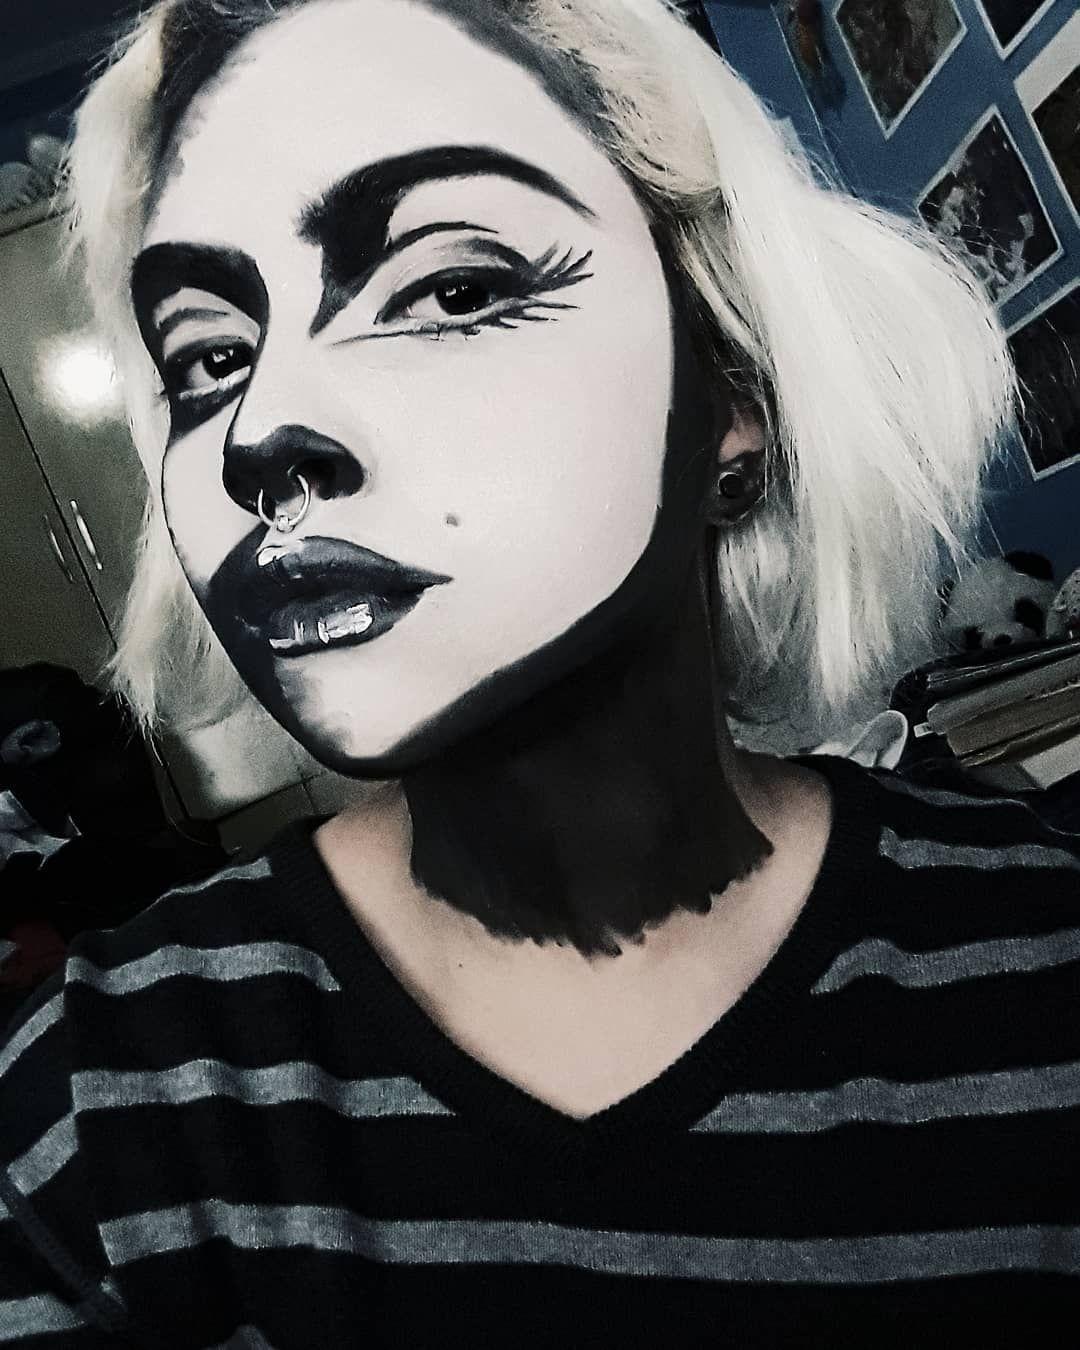 Black and white pop art halloween makeup in 2019 Black